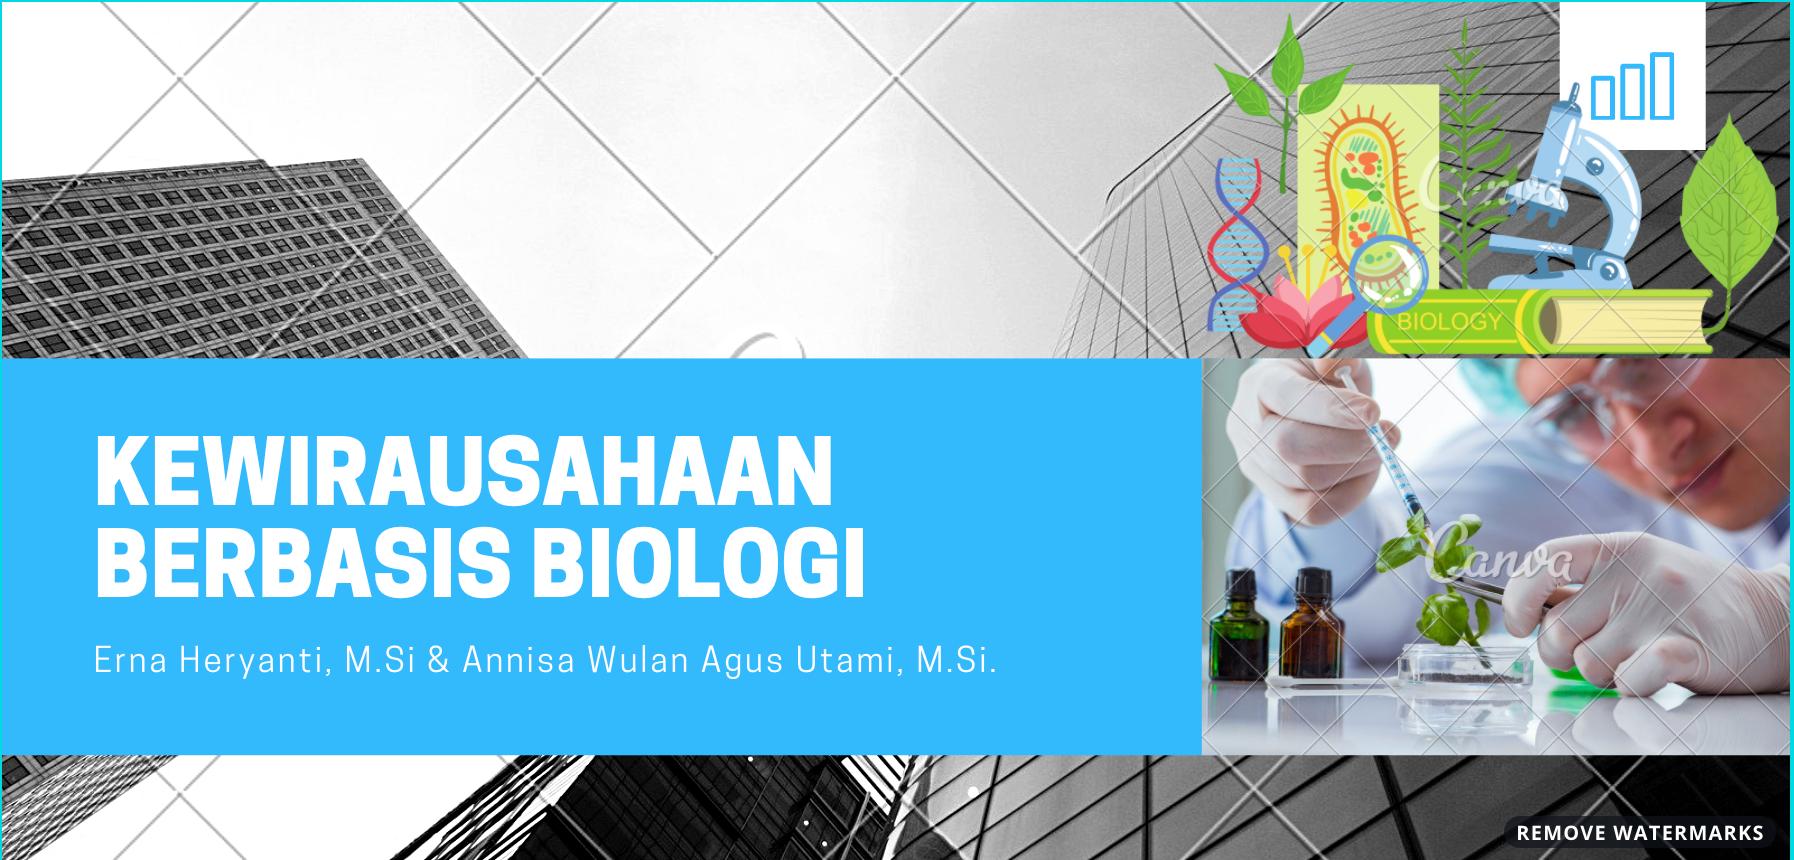 Kewirausahaan Berbasis Biologi 115 PBA